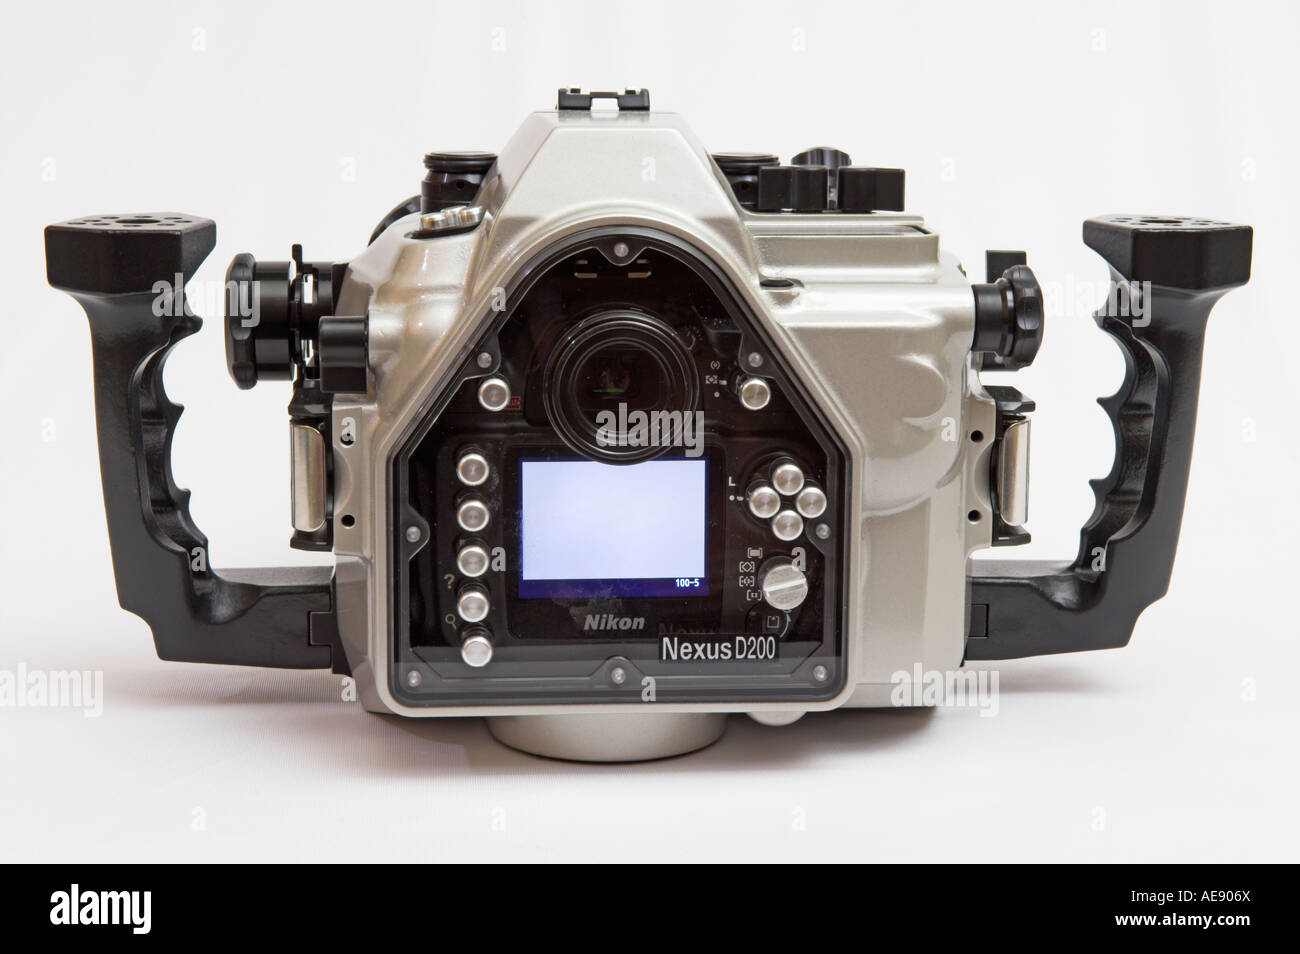 Closeup rear view Nexus D200 underwater camera housing for Nikon - Stock Image